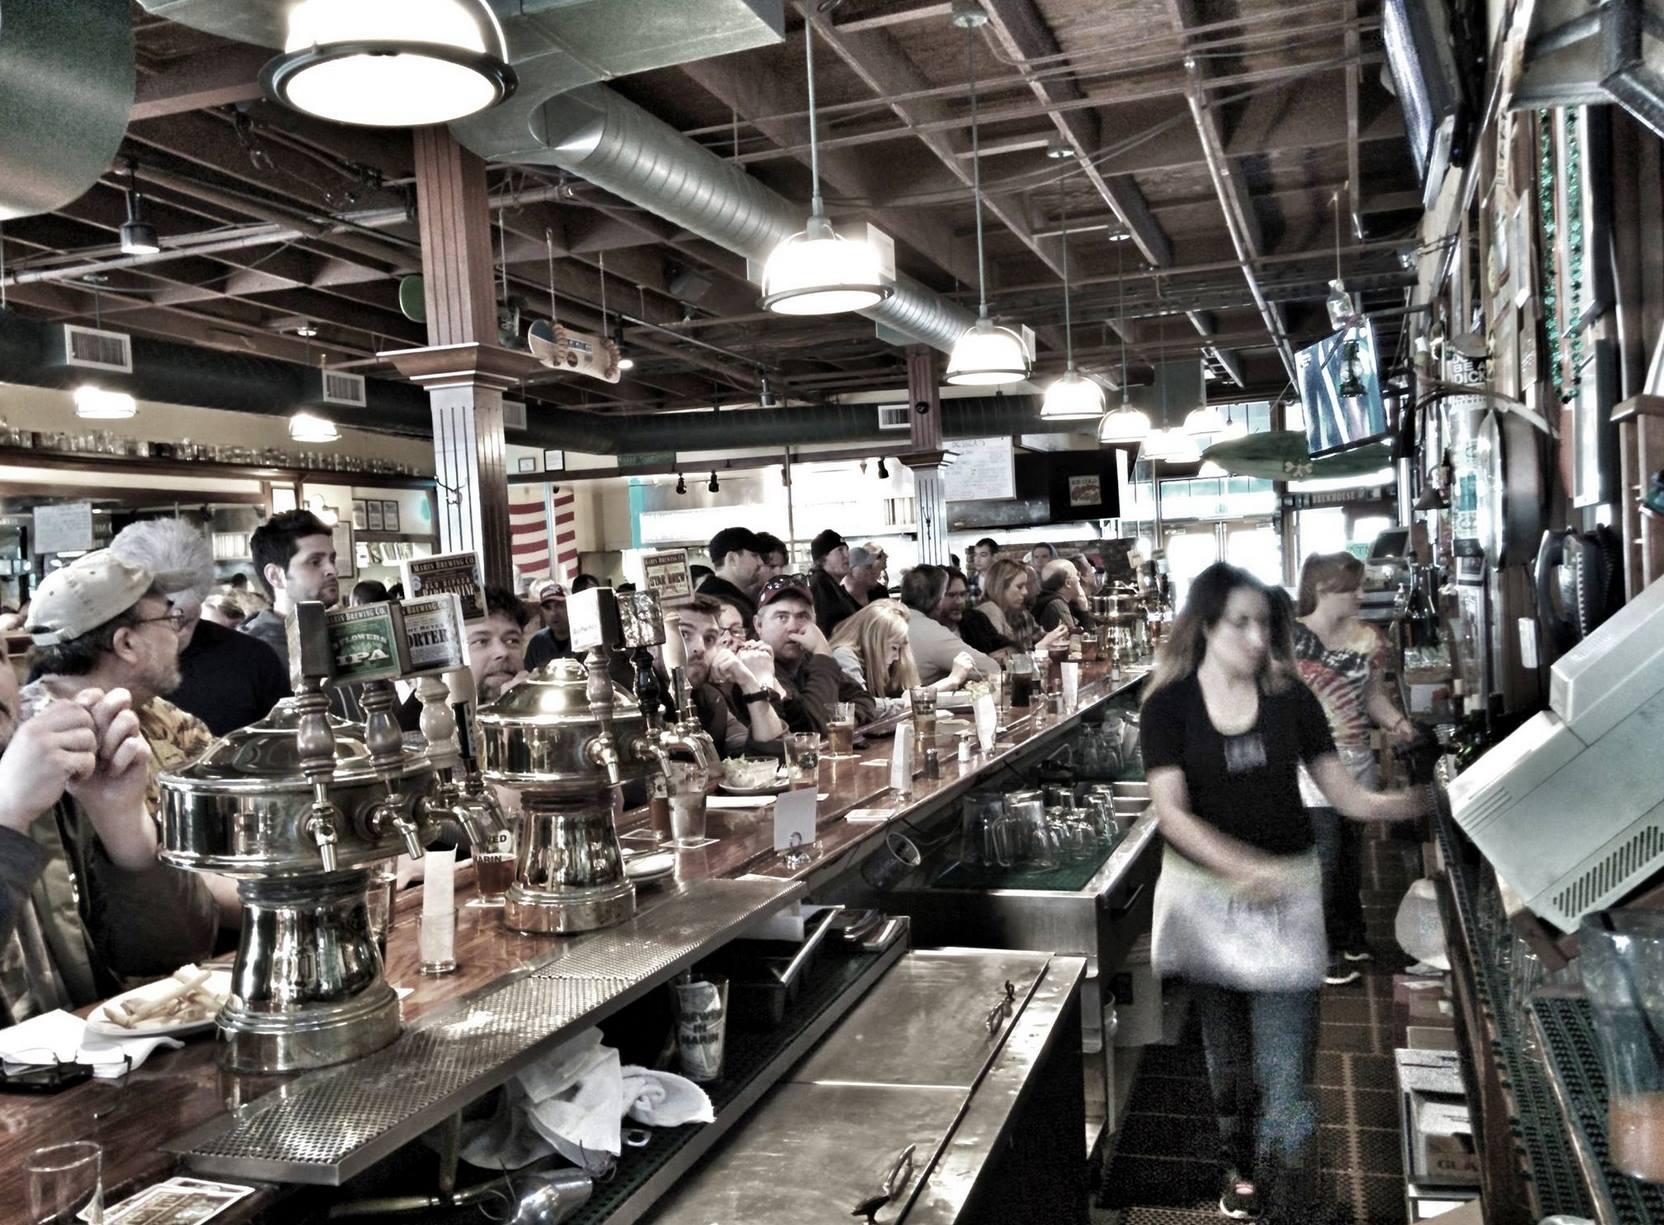 The Top 10 Bars In Marin County California